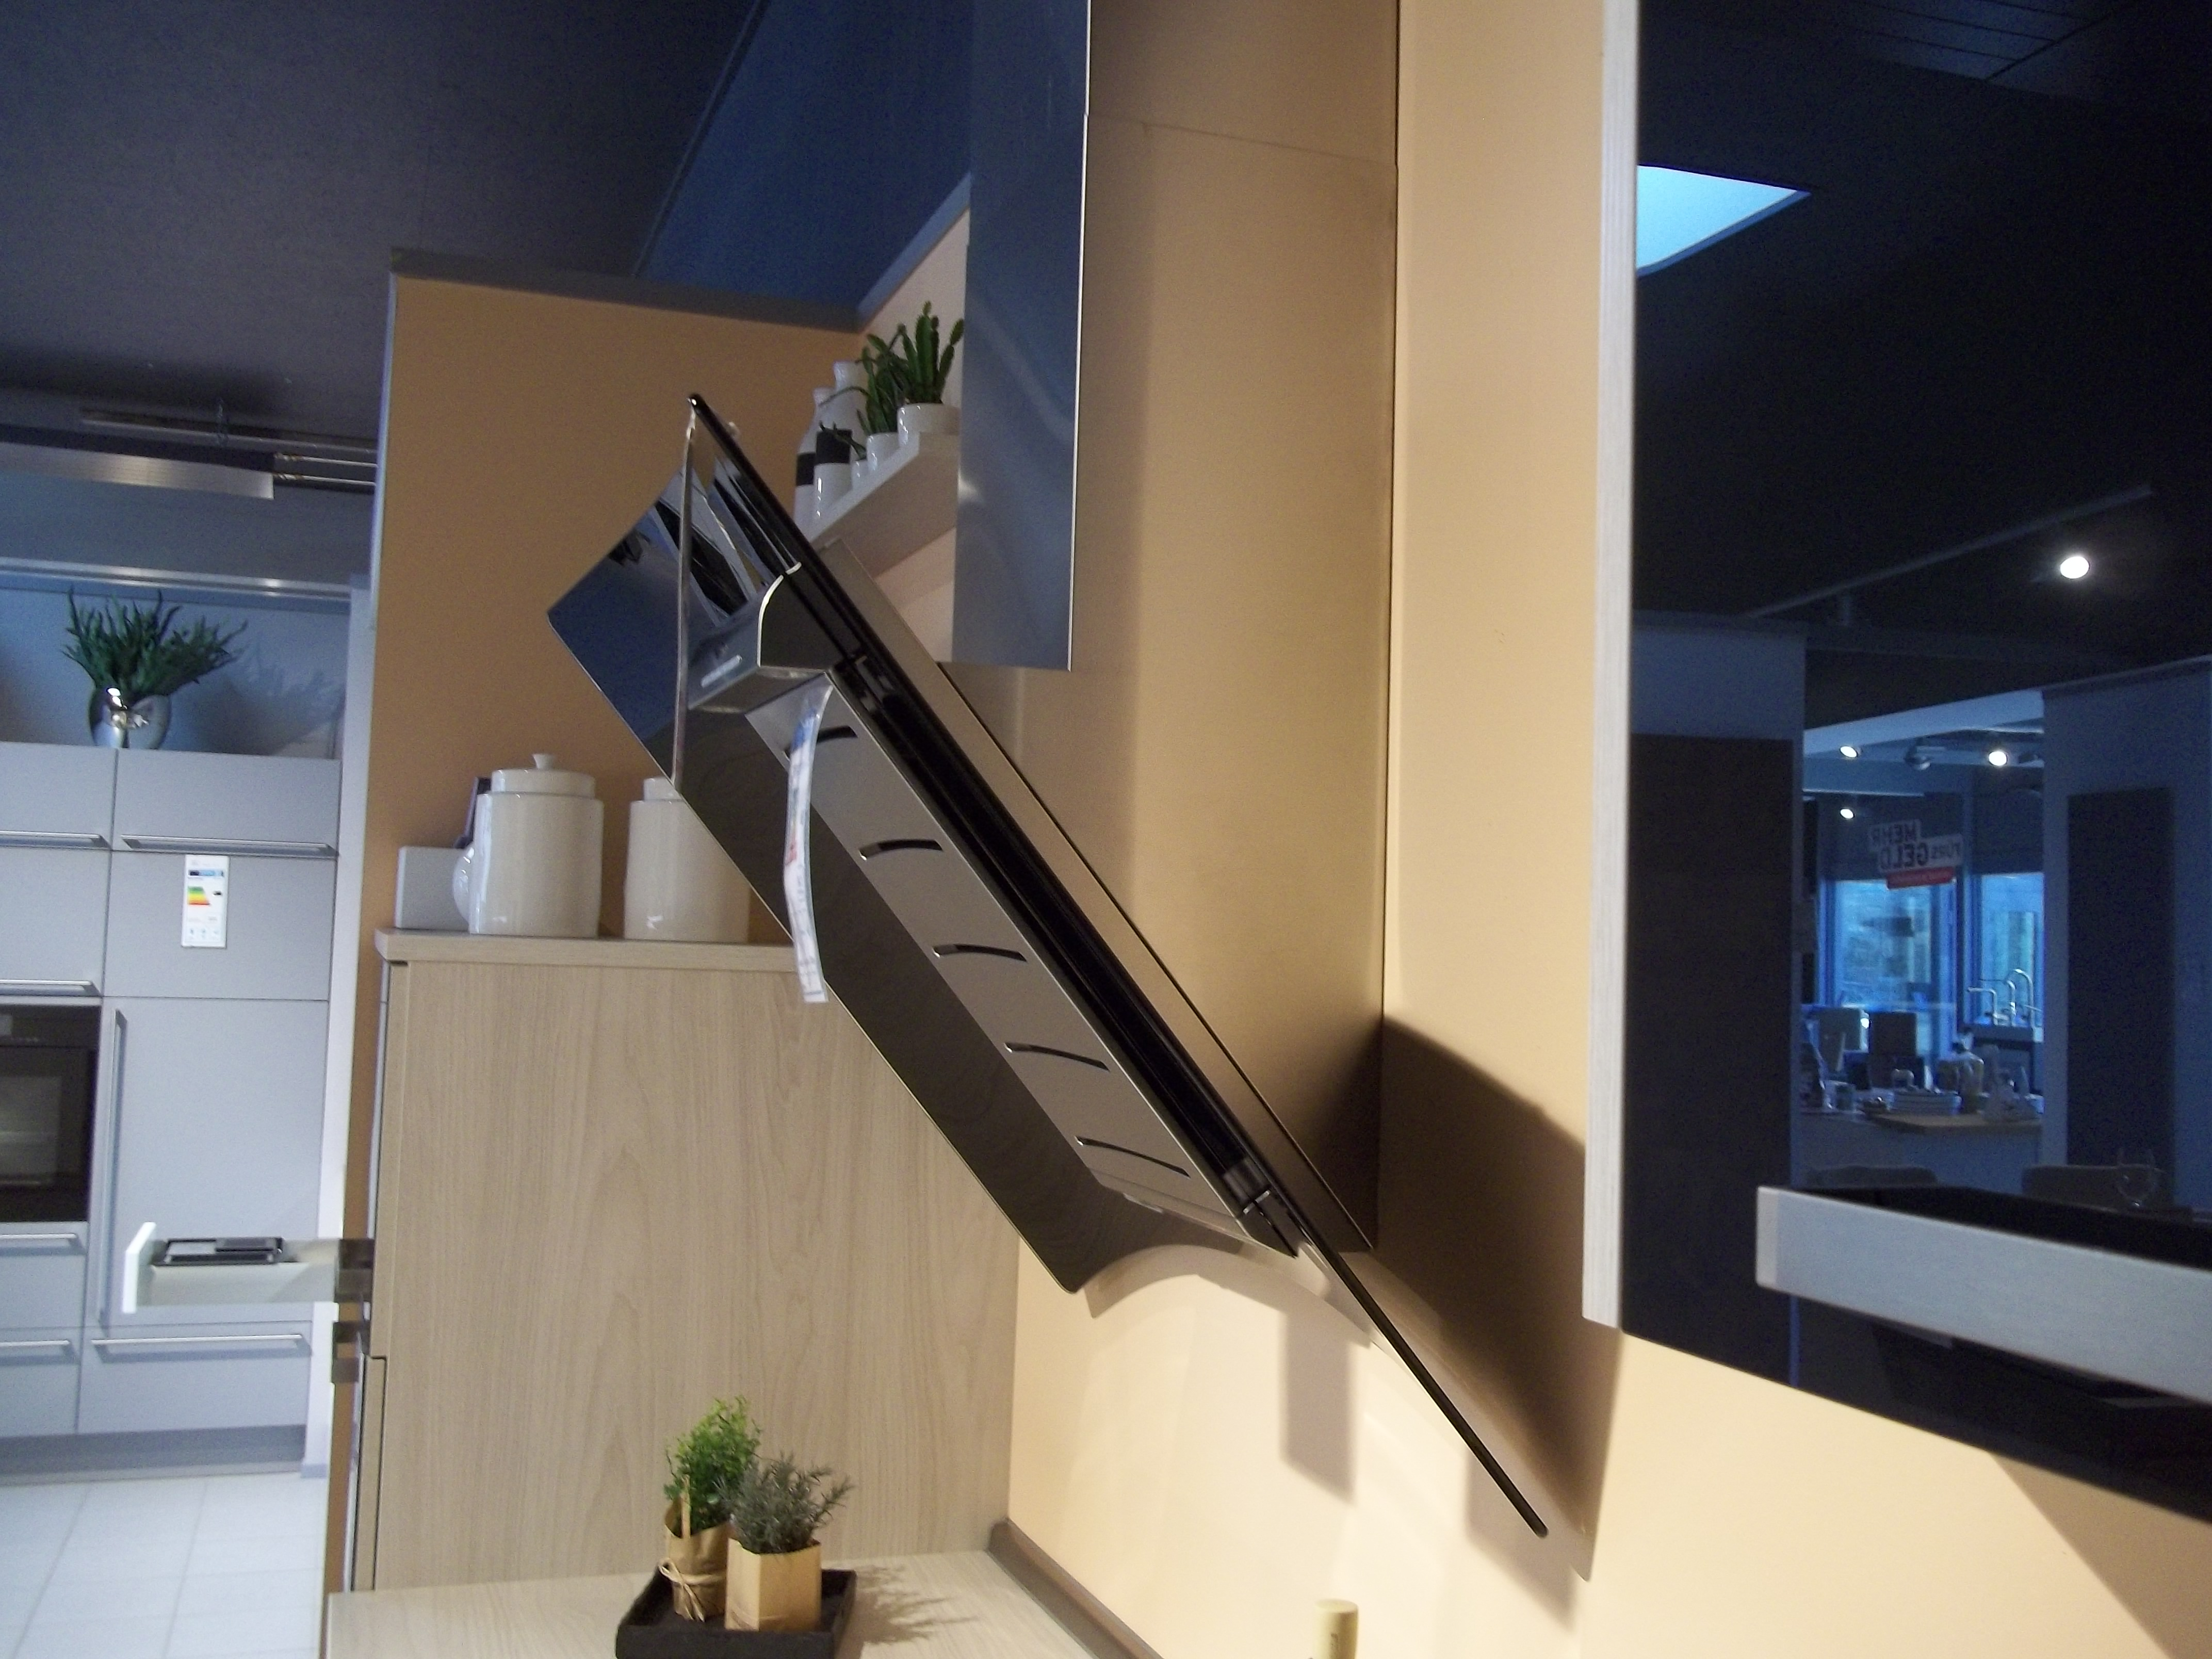 mein ausstellungsst ck miele dunstabzug da 289 4 flyer. Black Bedroom Furniture Sets. Home Design Ideas